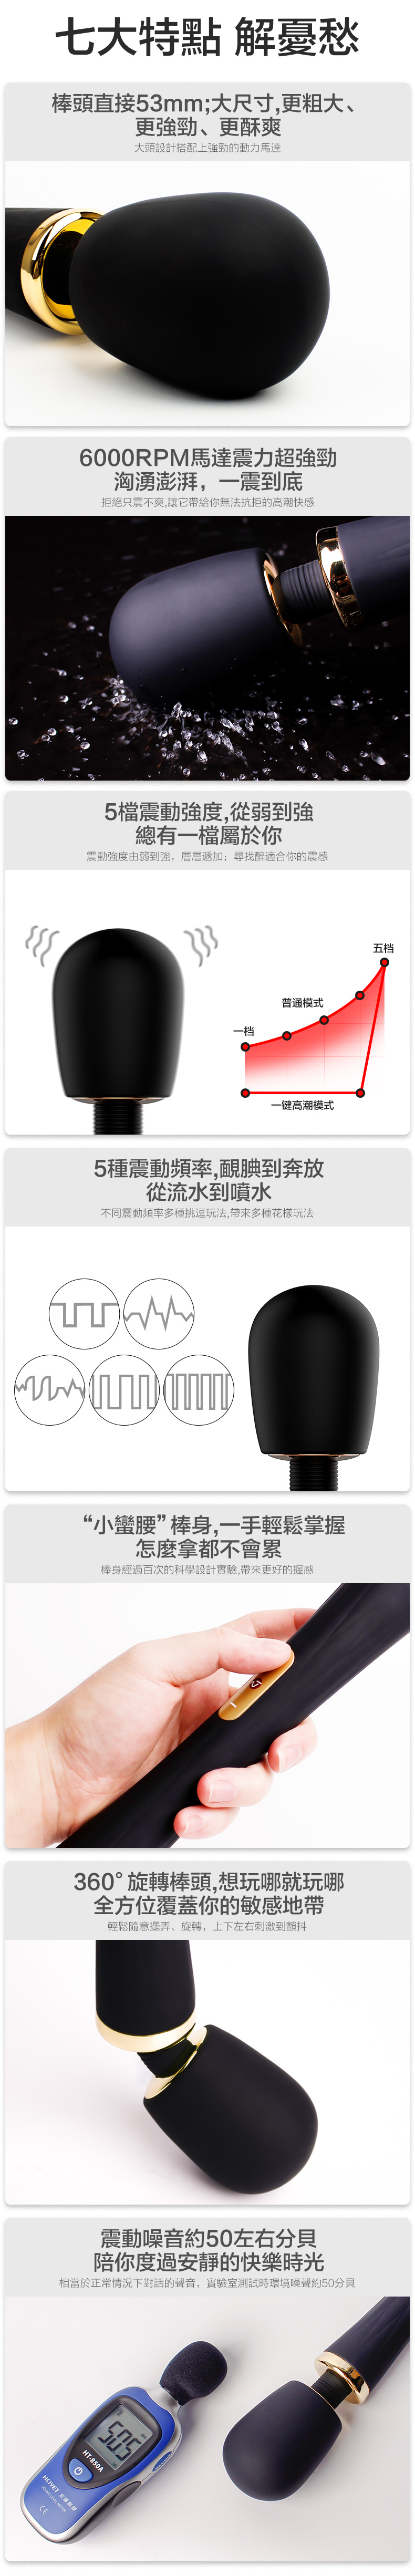 Nomi Tang Power Wand USB 超強震動按摩棒